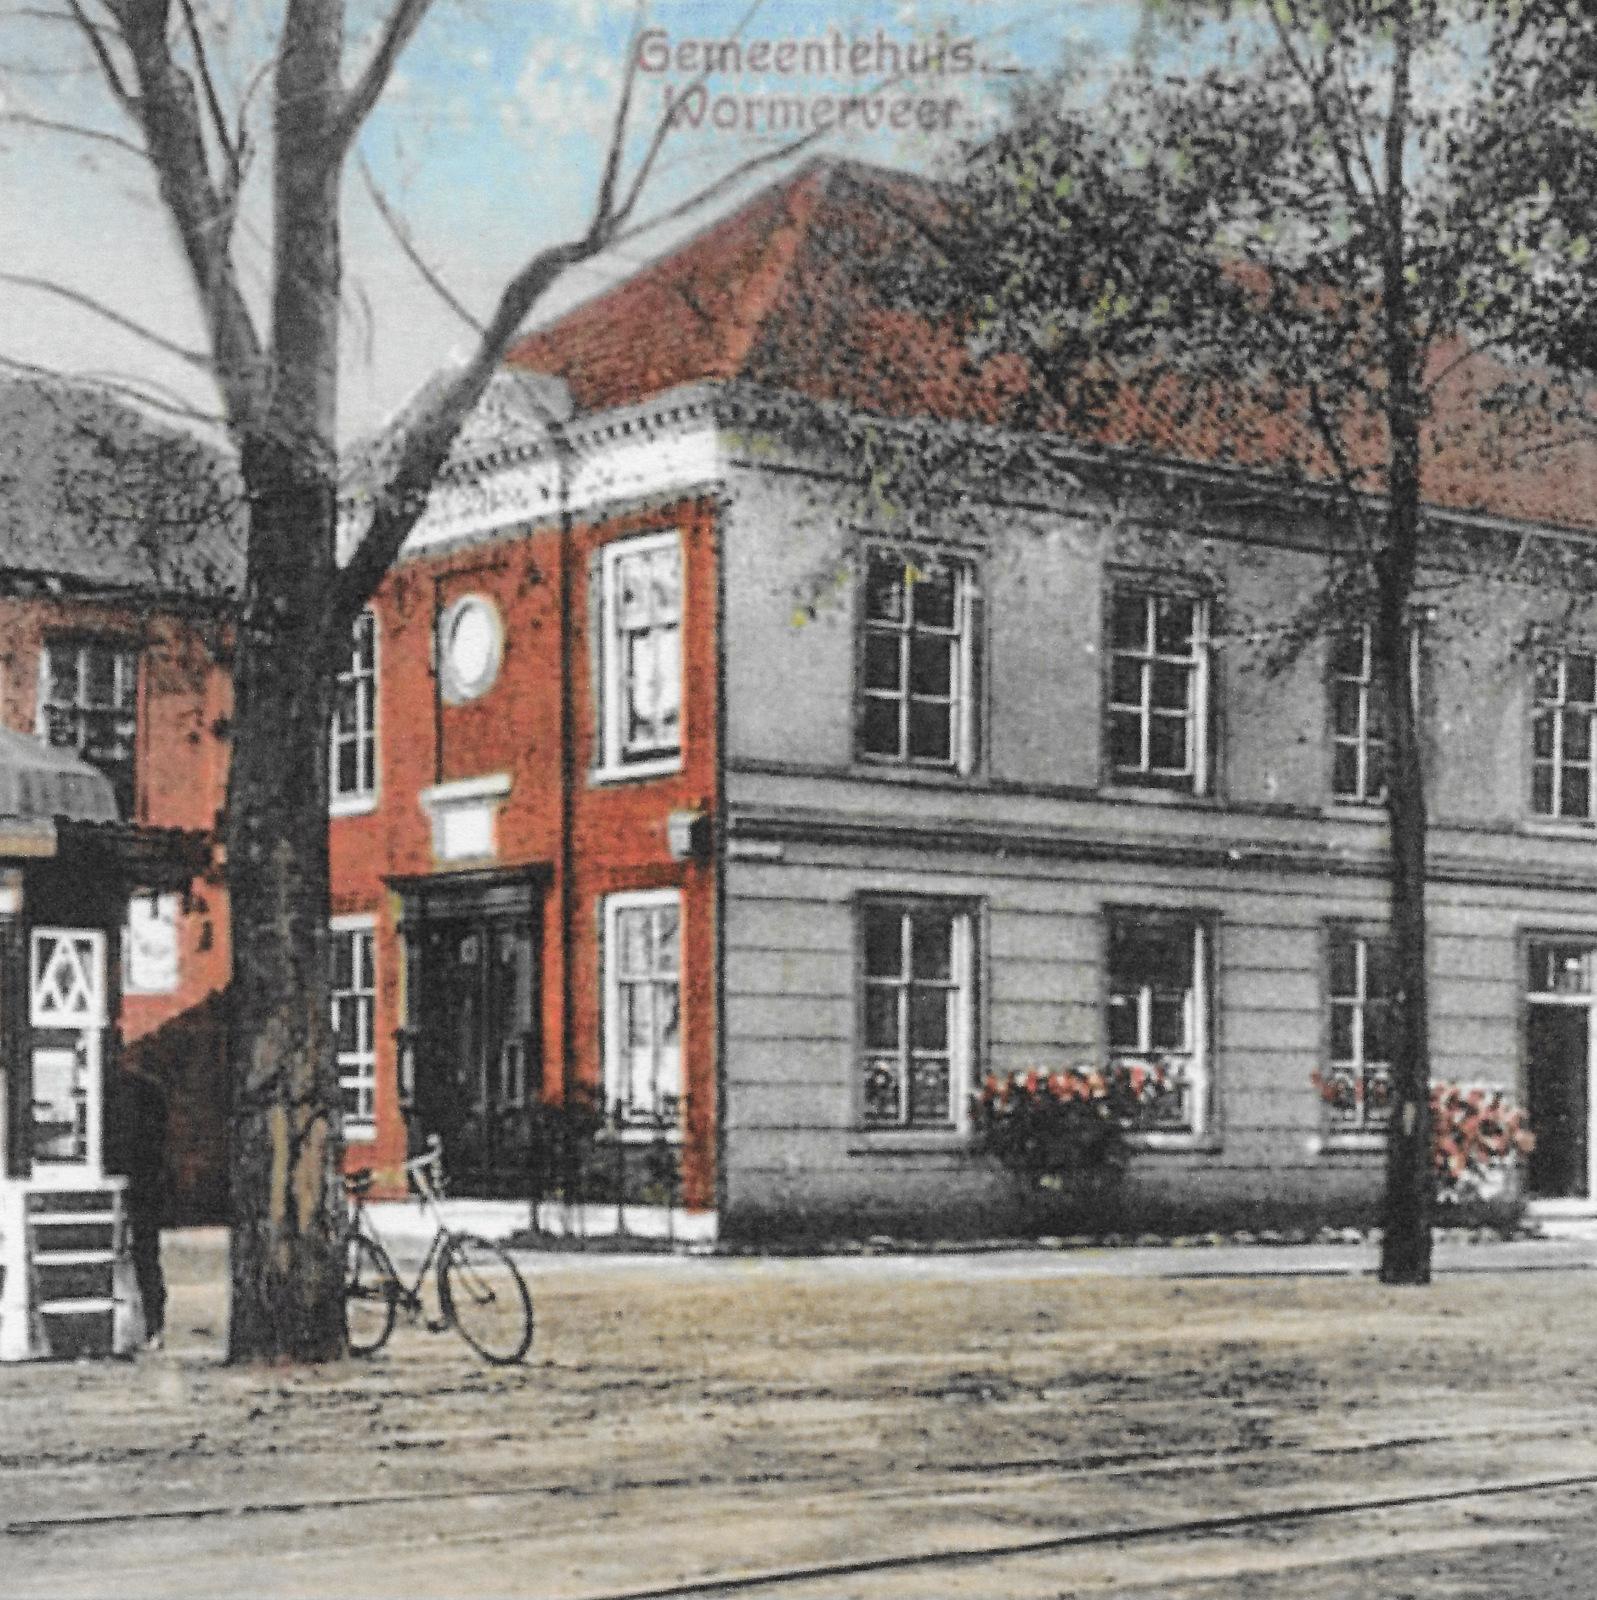 Gemeentehuis Wormerveer